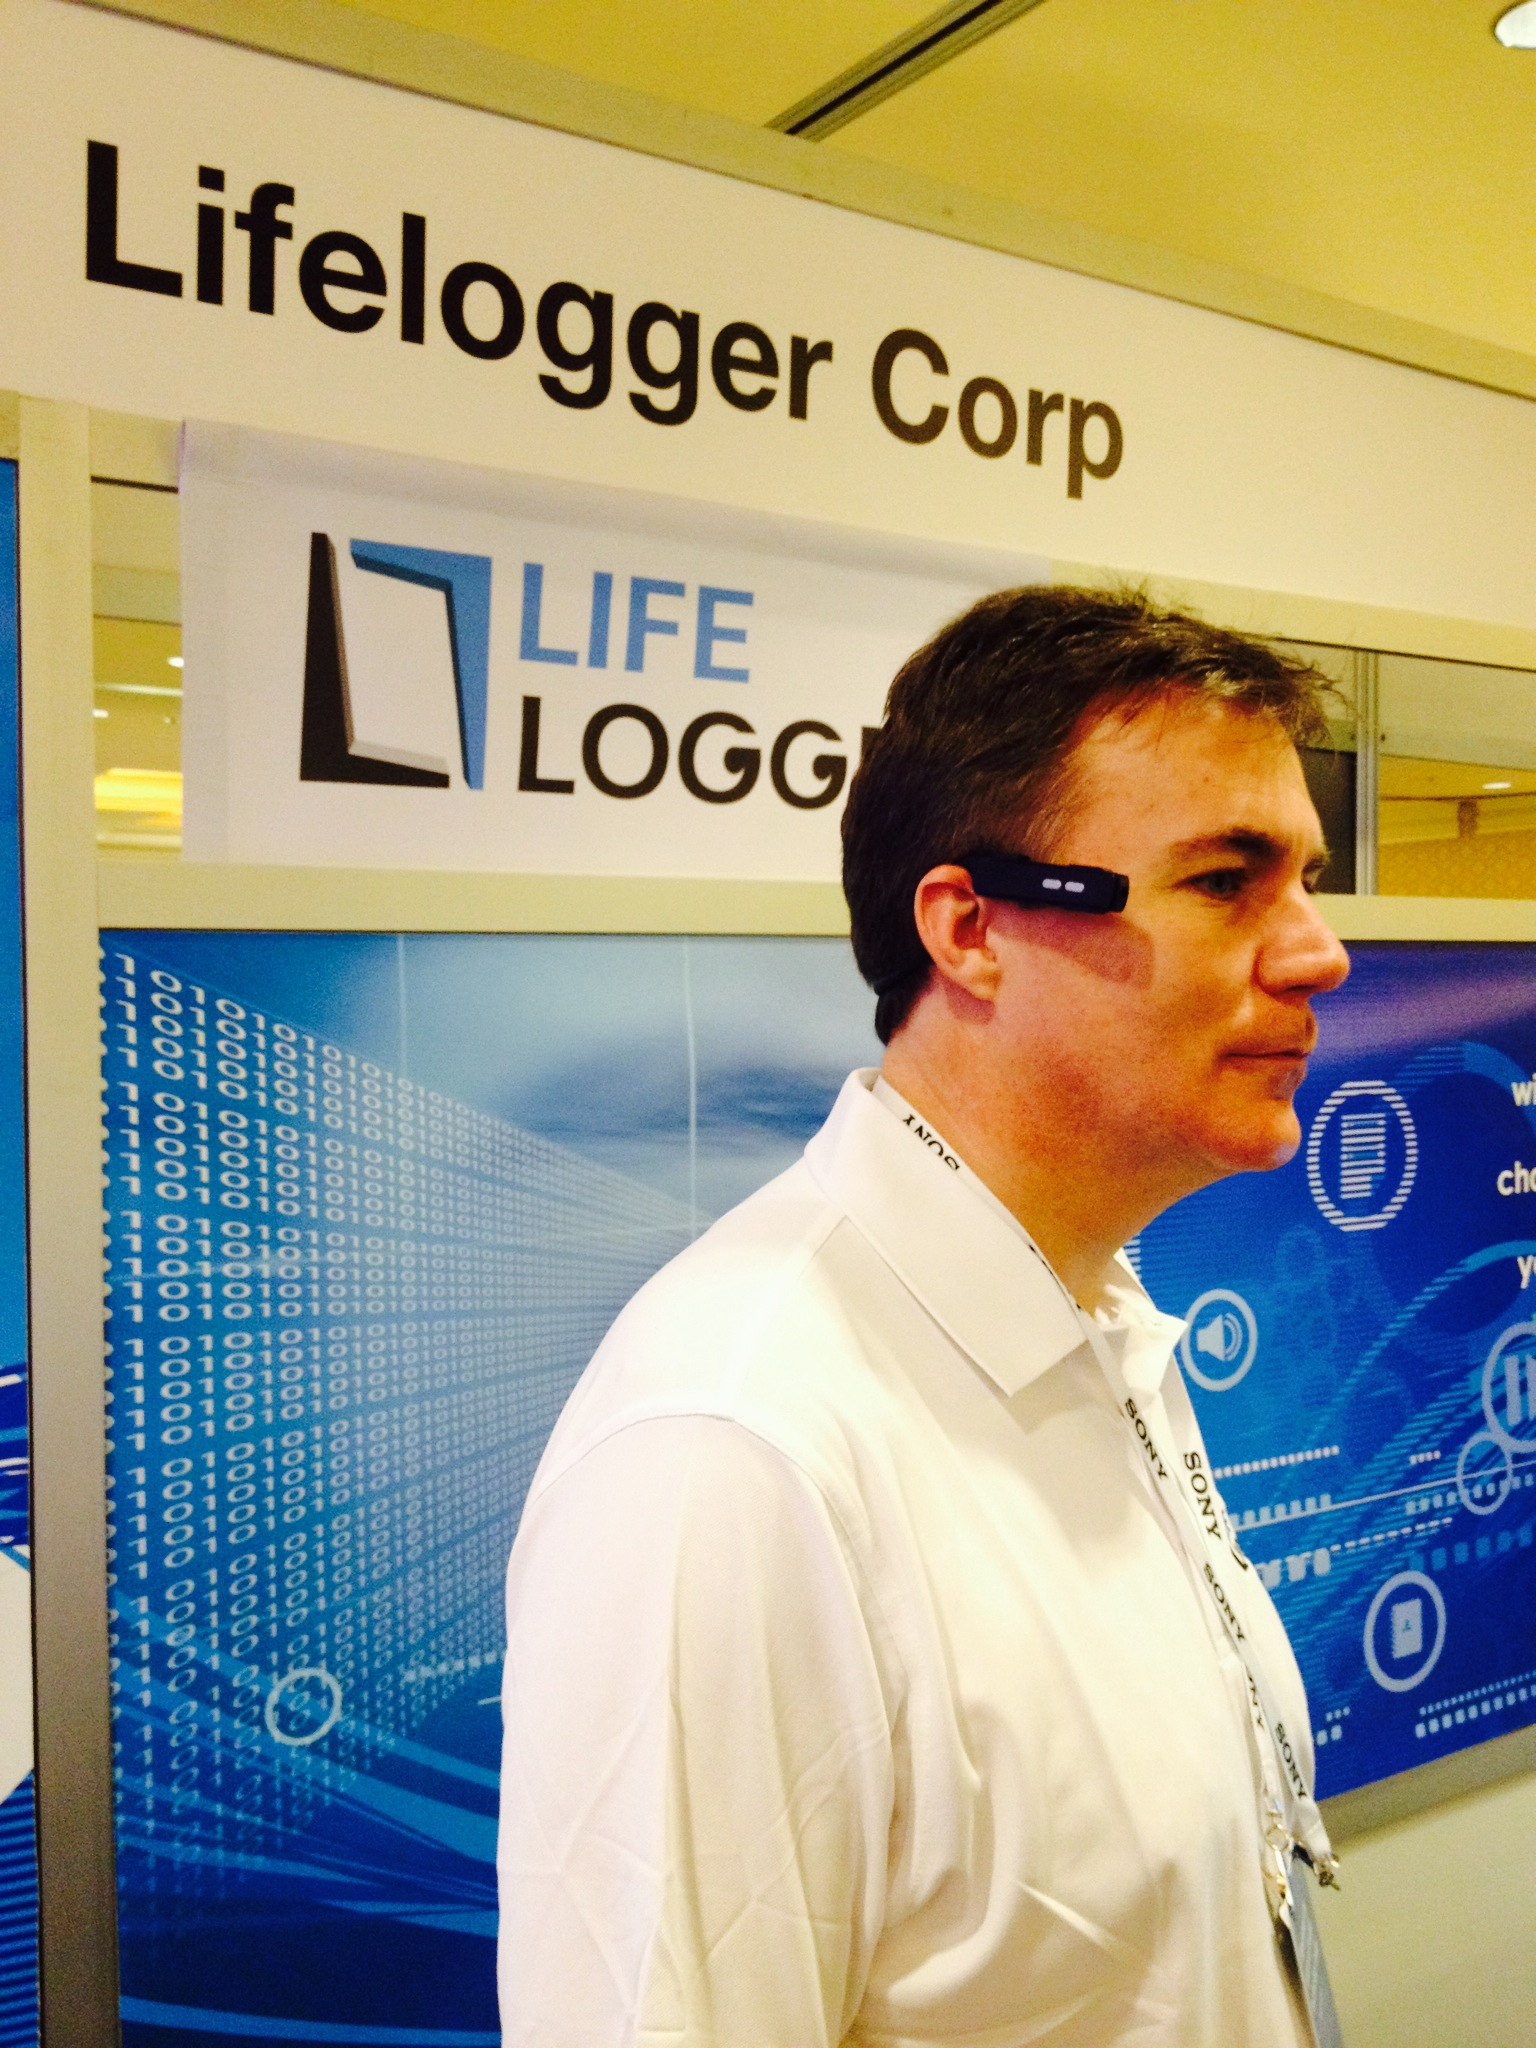 Stew_of_lifelogger